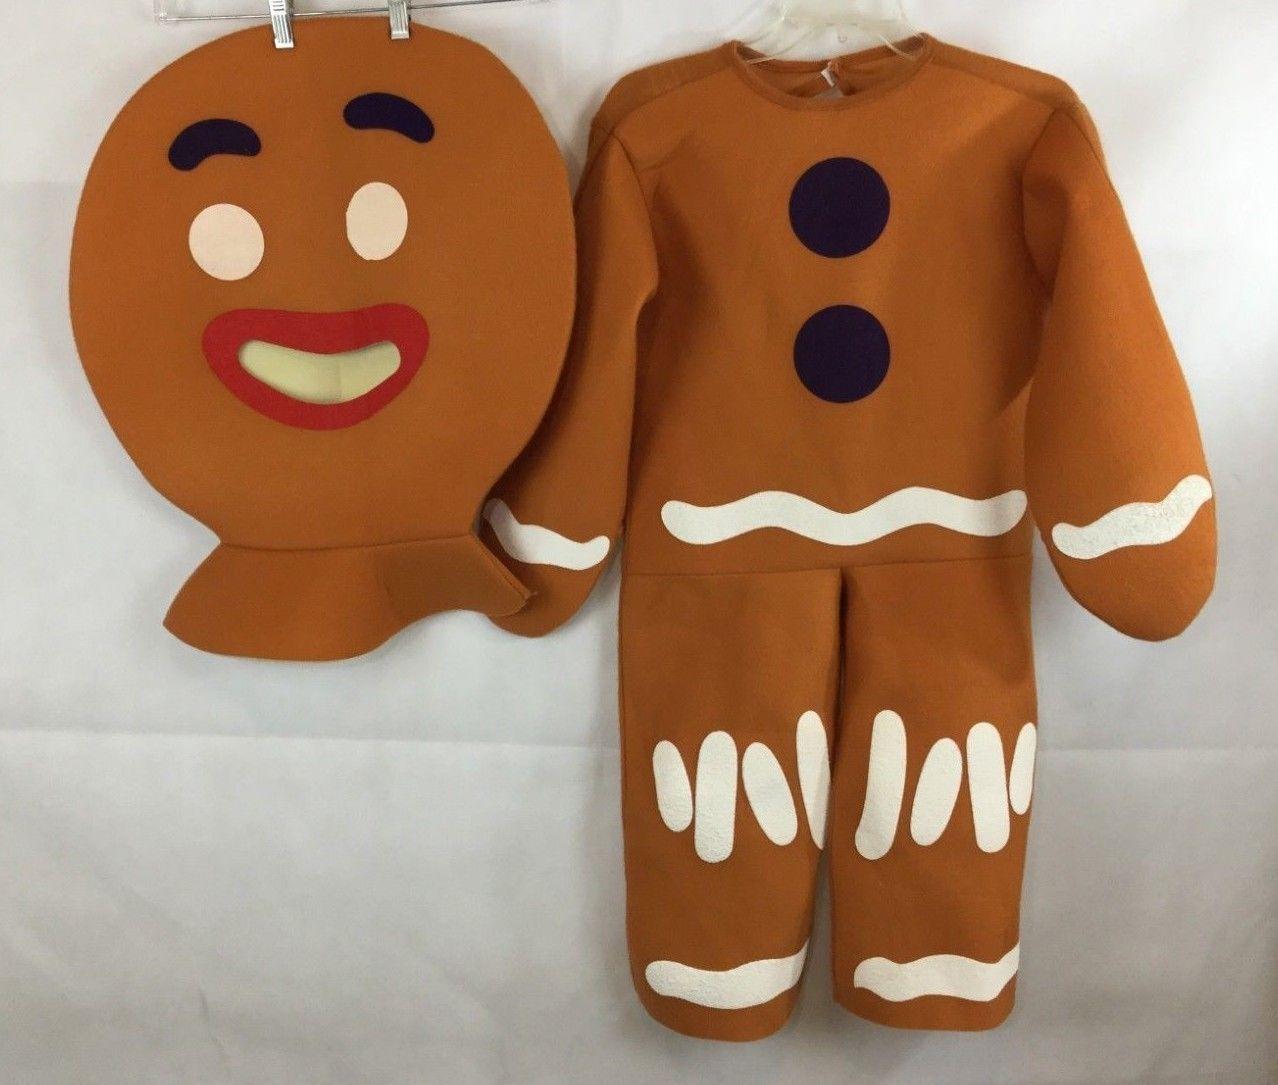 26.99 Shrek Gingerbread Man Costume Small Boys Girls 2